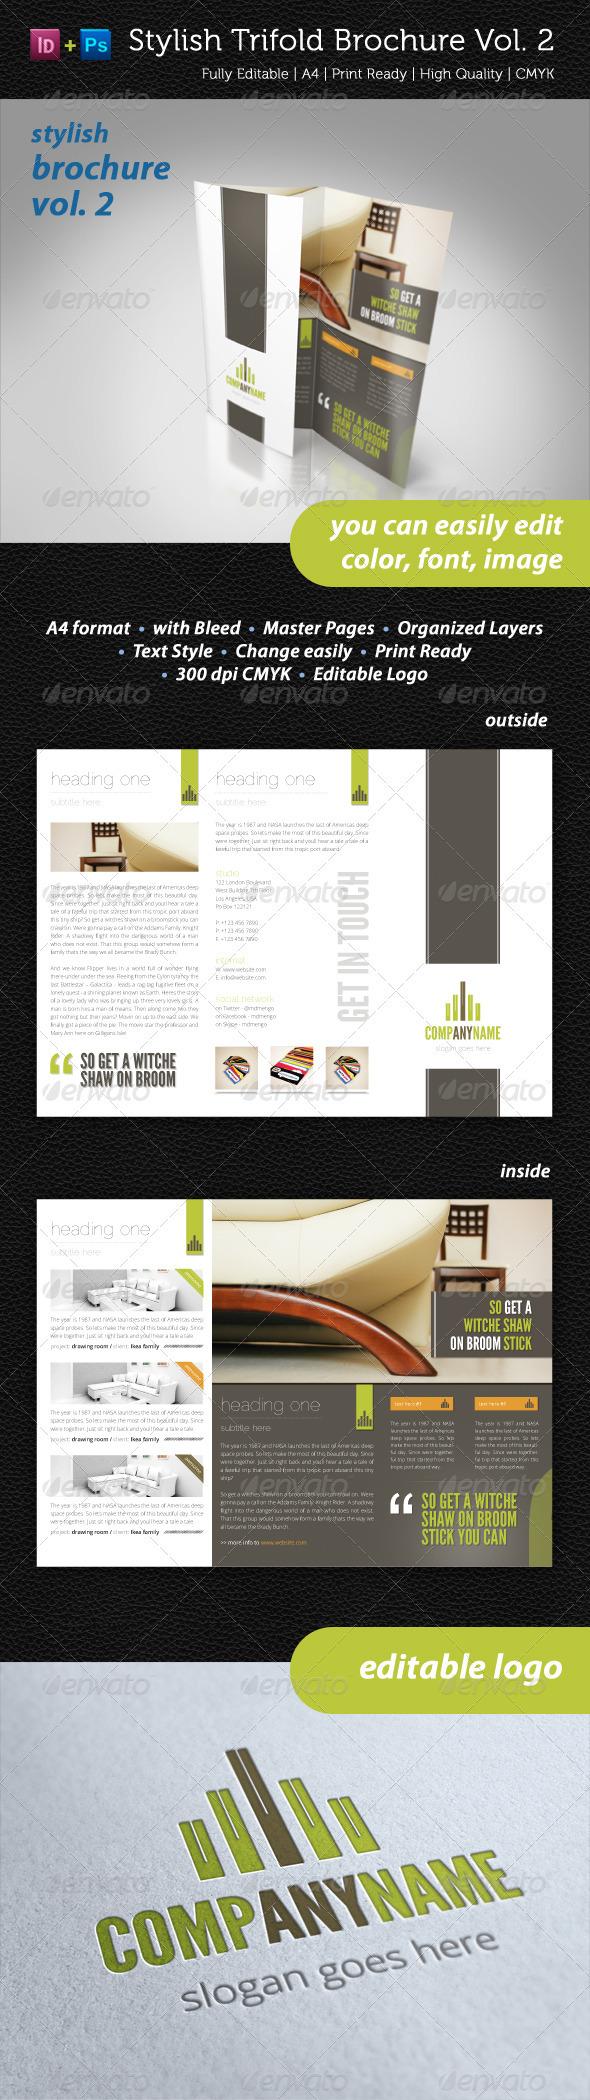 GraphicRiver Stylish Trifold Brochure Vol 2 2370972